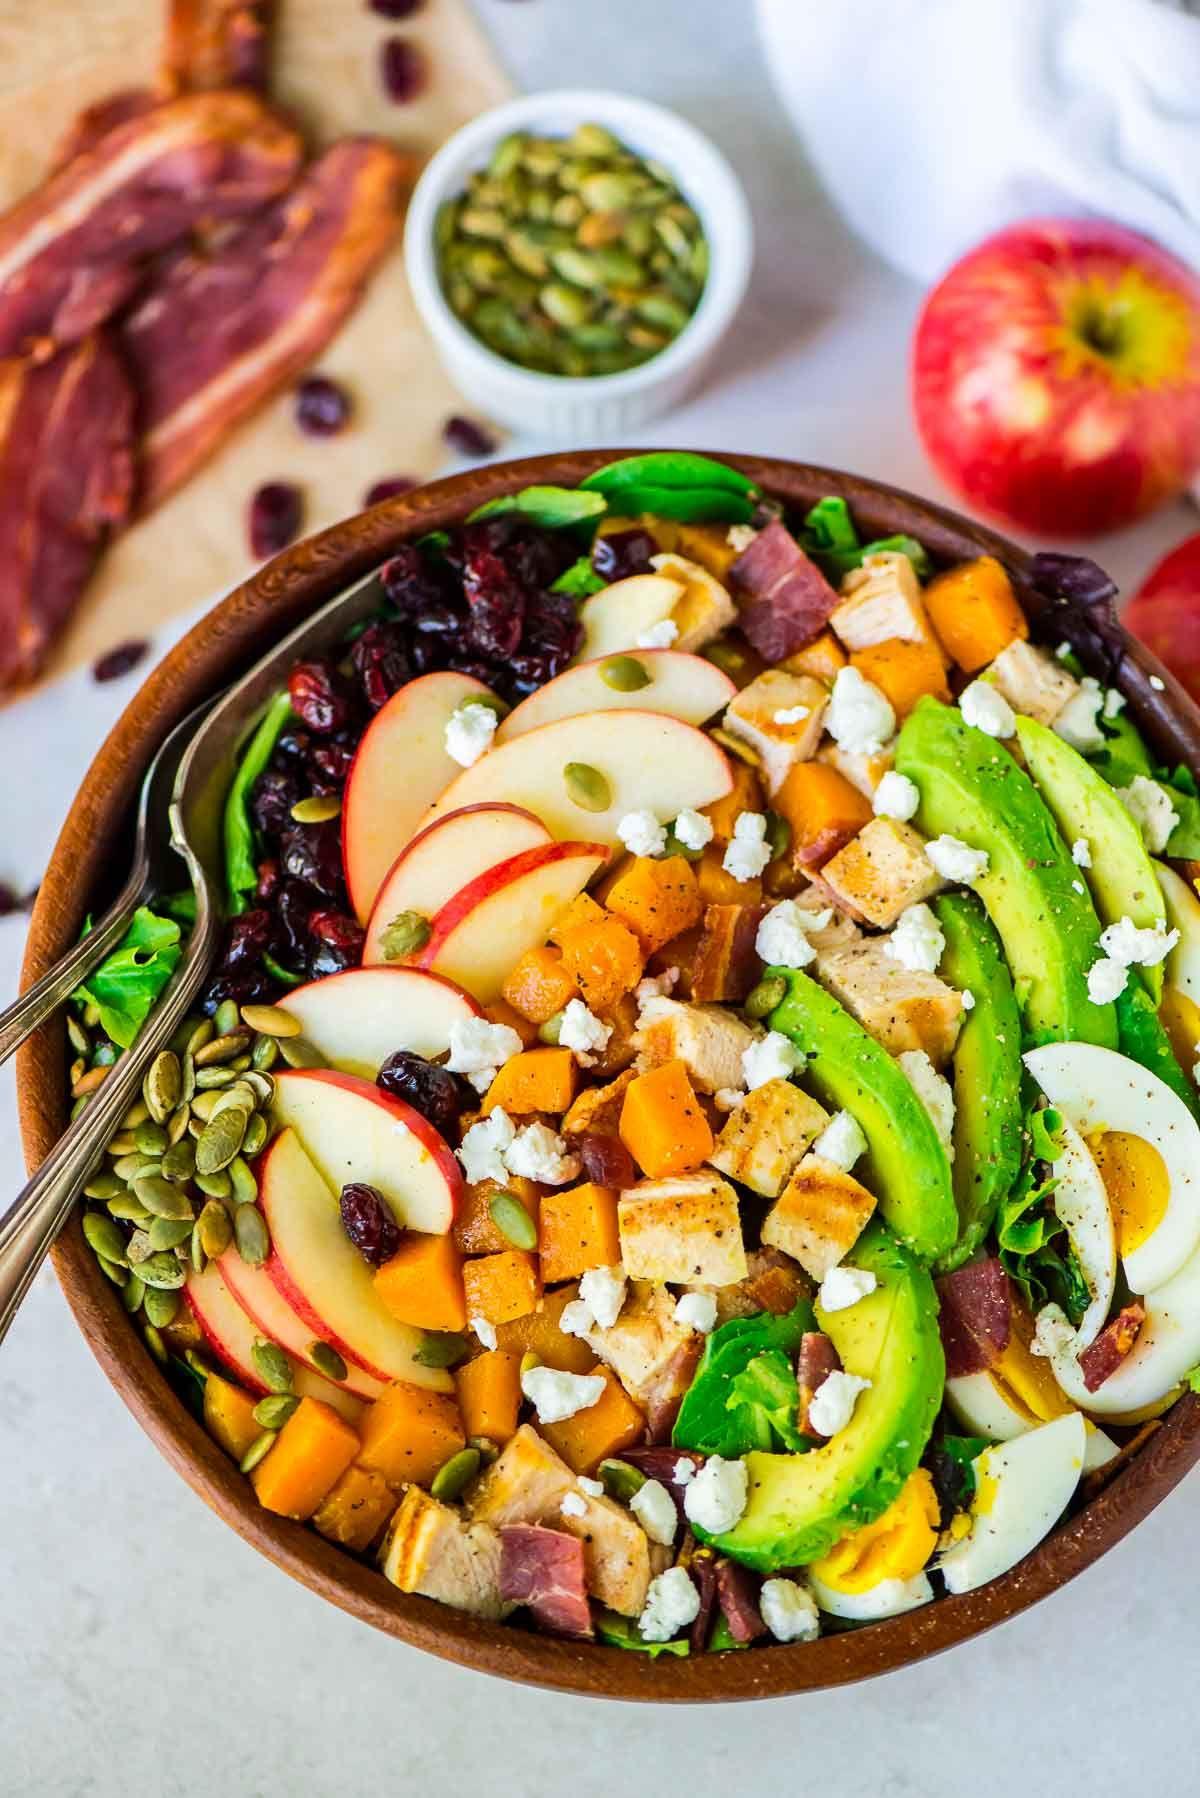 27 Easy Christmas Salad Recipes - Healthy Holiday Salad Ideas